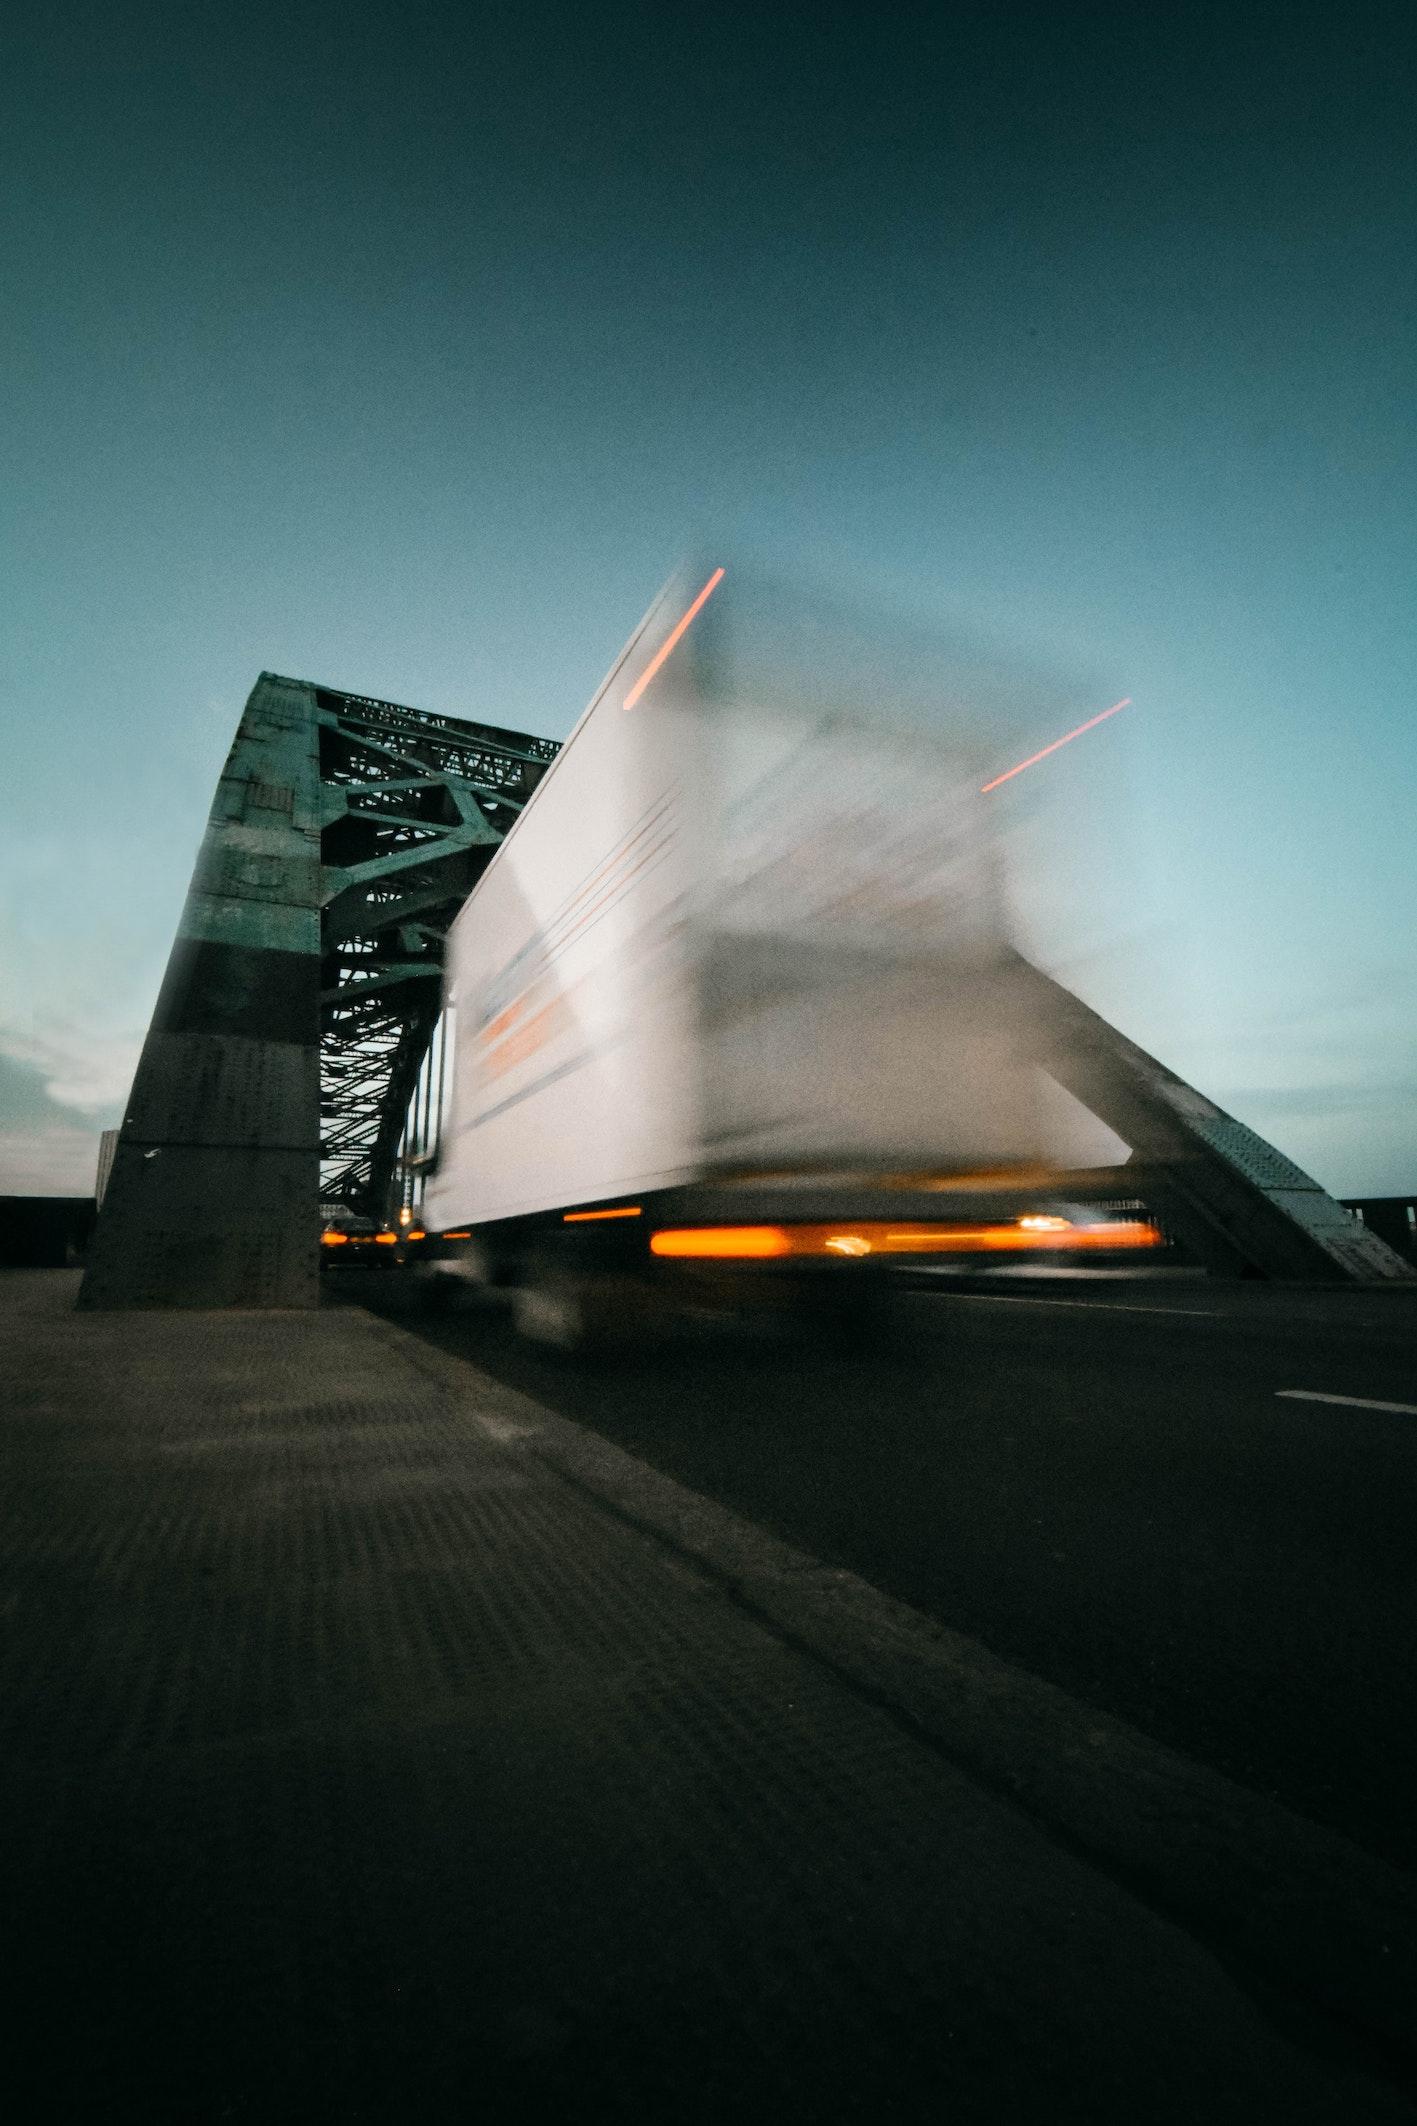 Stückgut im Systemverkehr mit Track and Trace